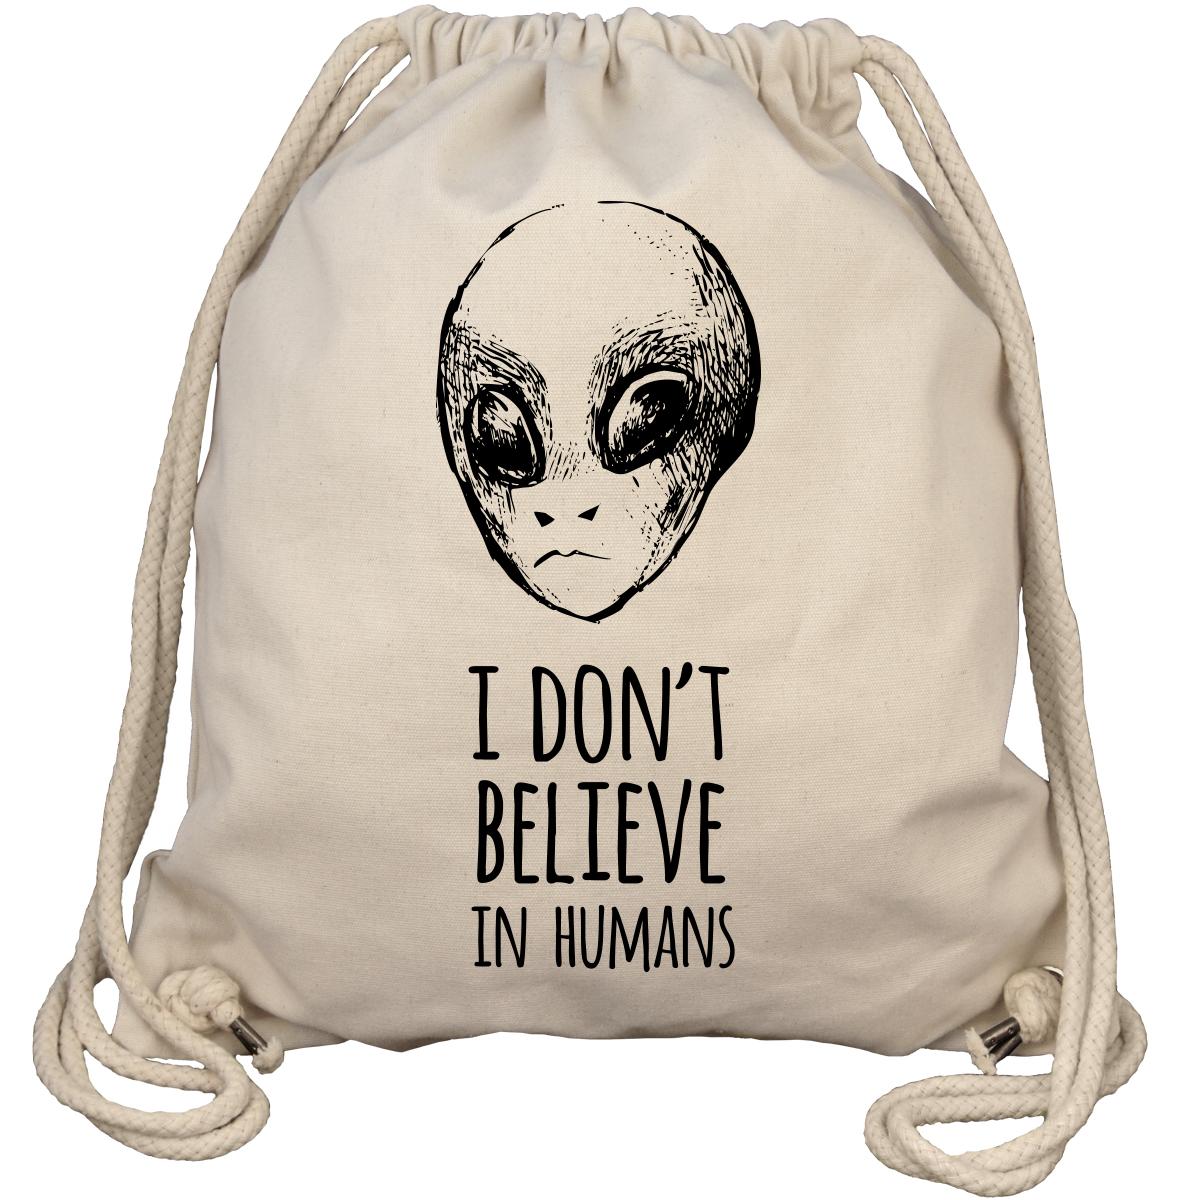 I Don't Believe In Humans - Alien - Gym Bag Turnbeutel